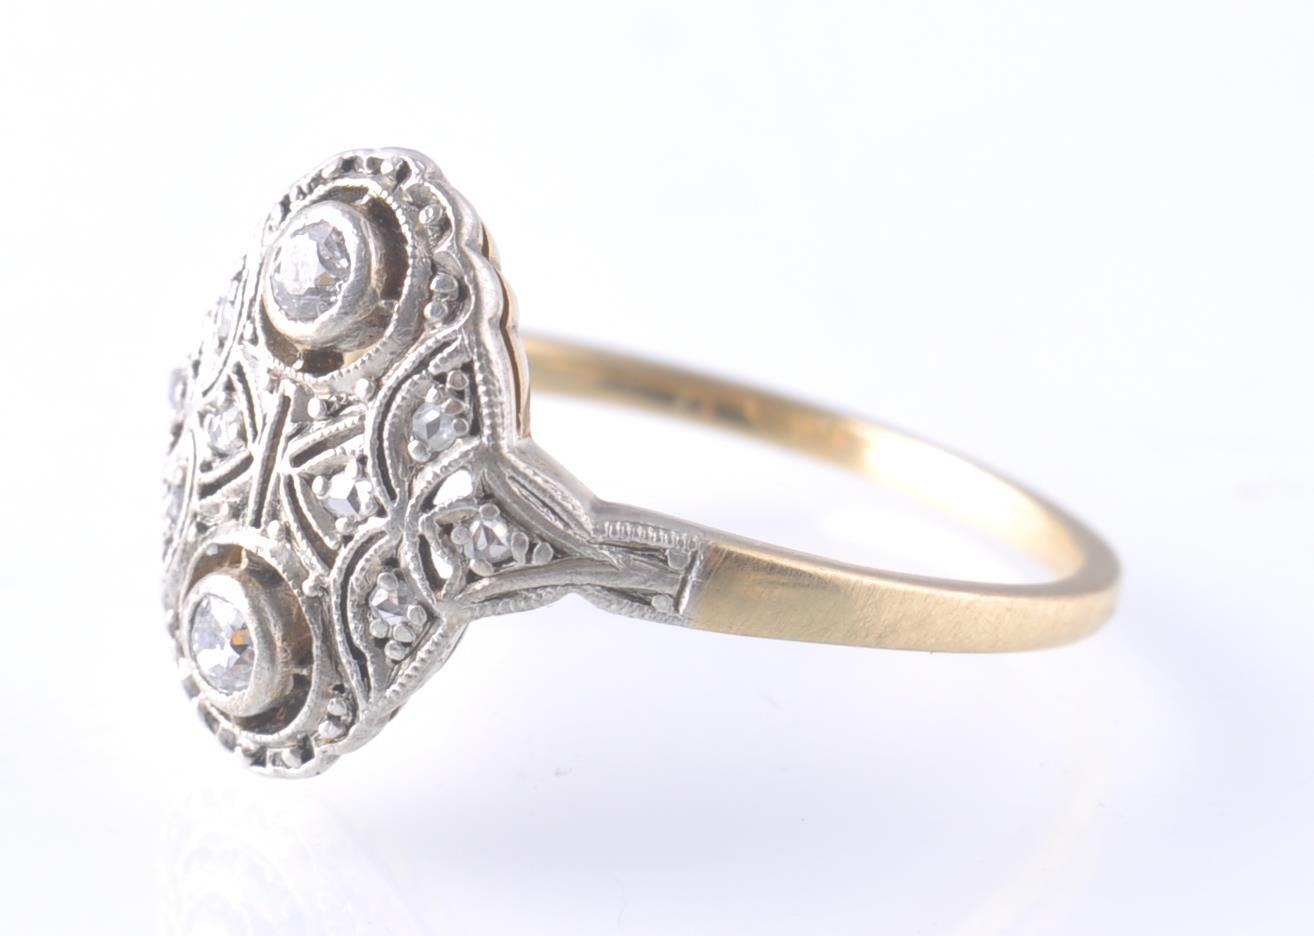 AN 18CT GOLD & PLATINUM ART DECO DIAMOND RING - Image 2 of 3